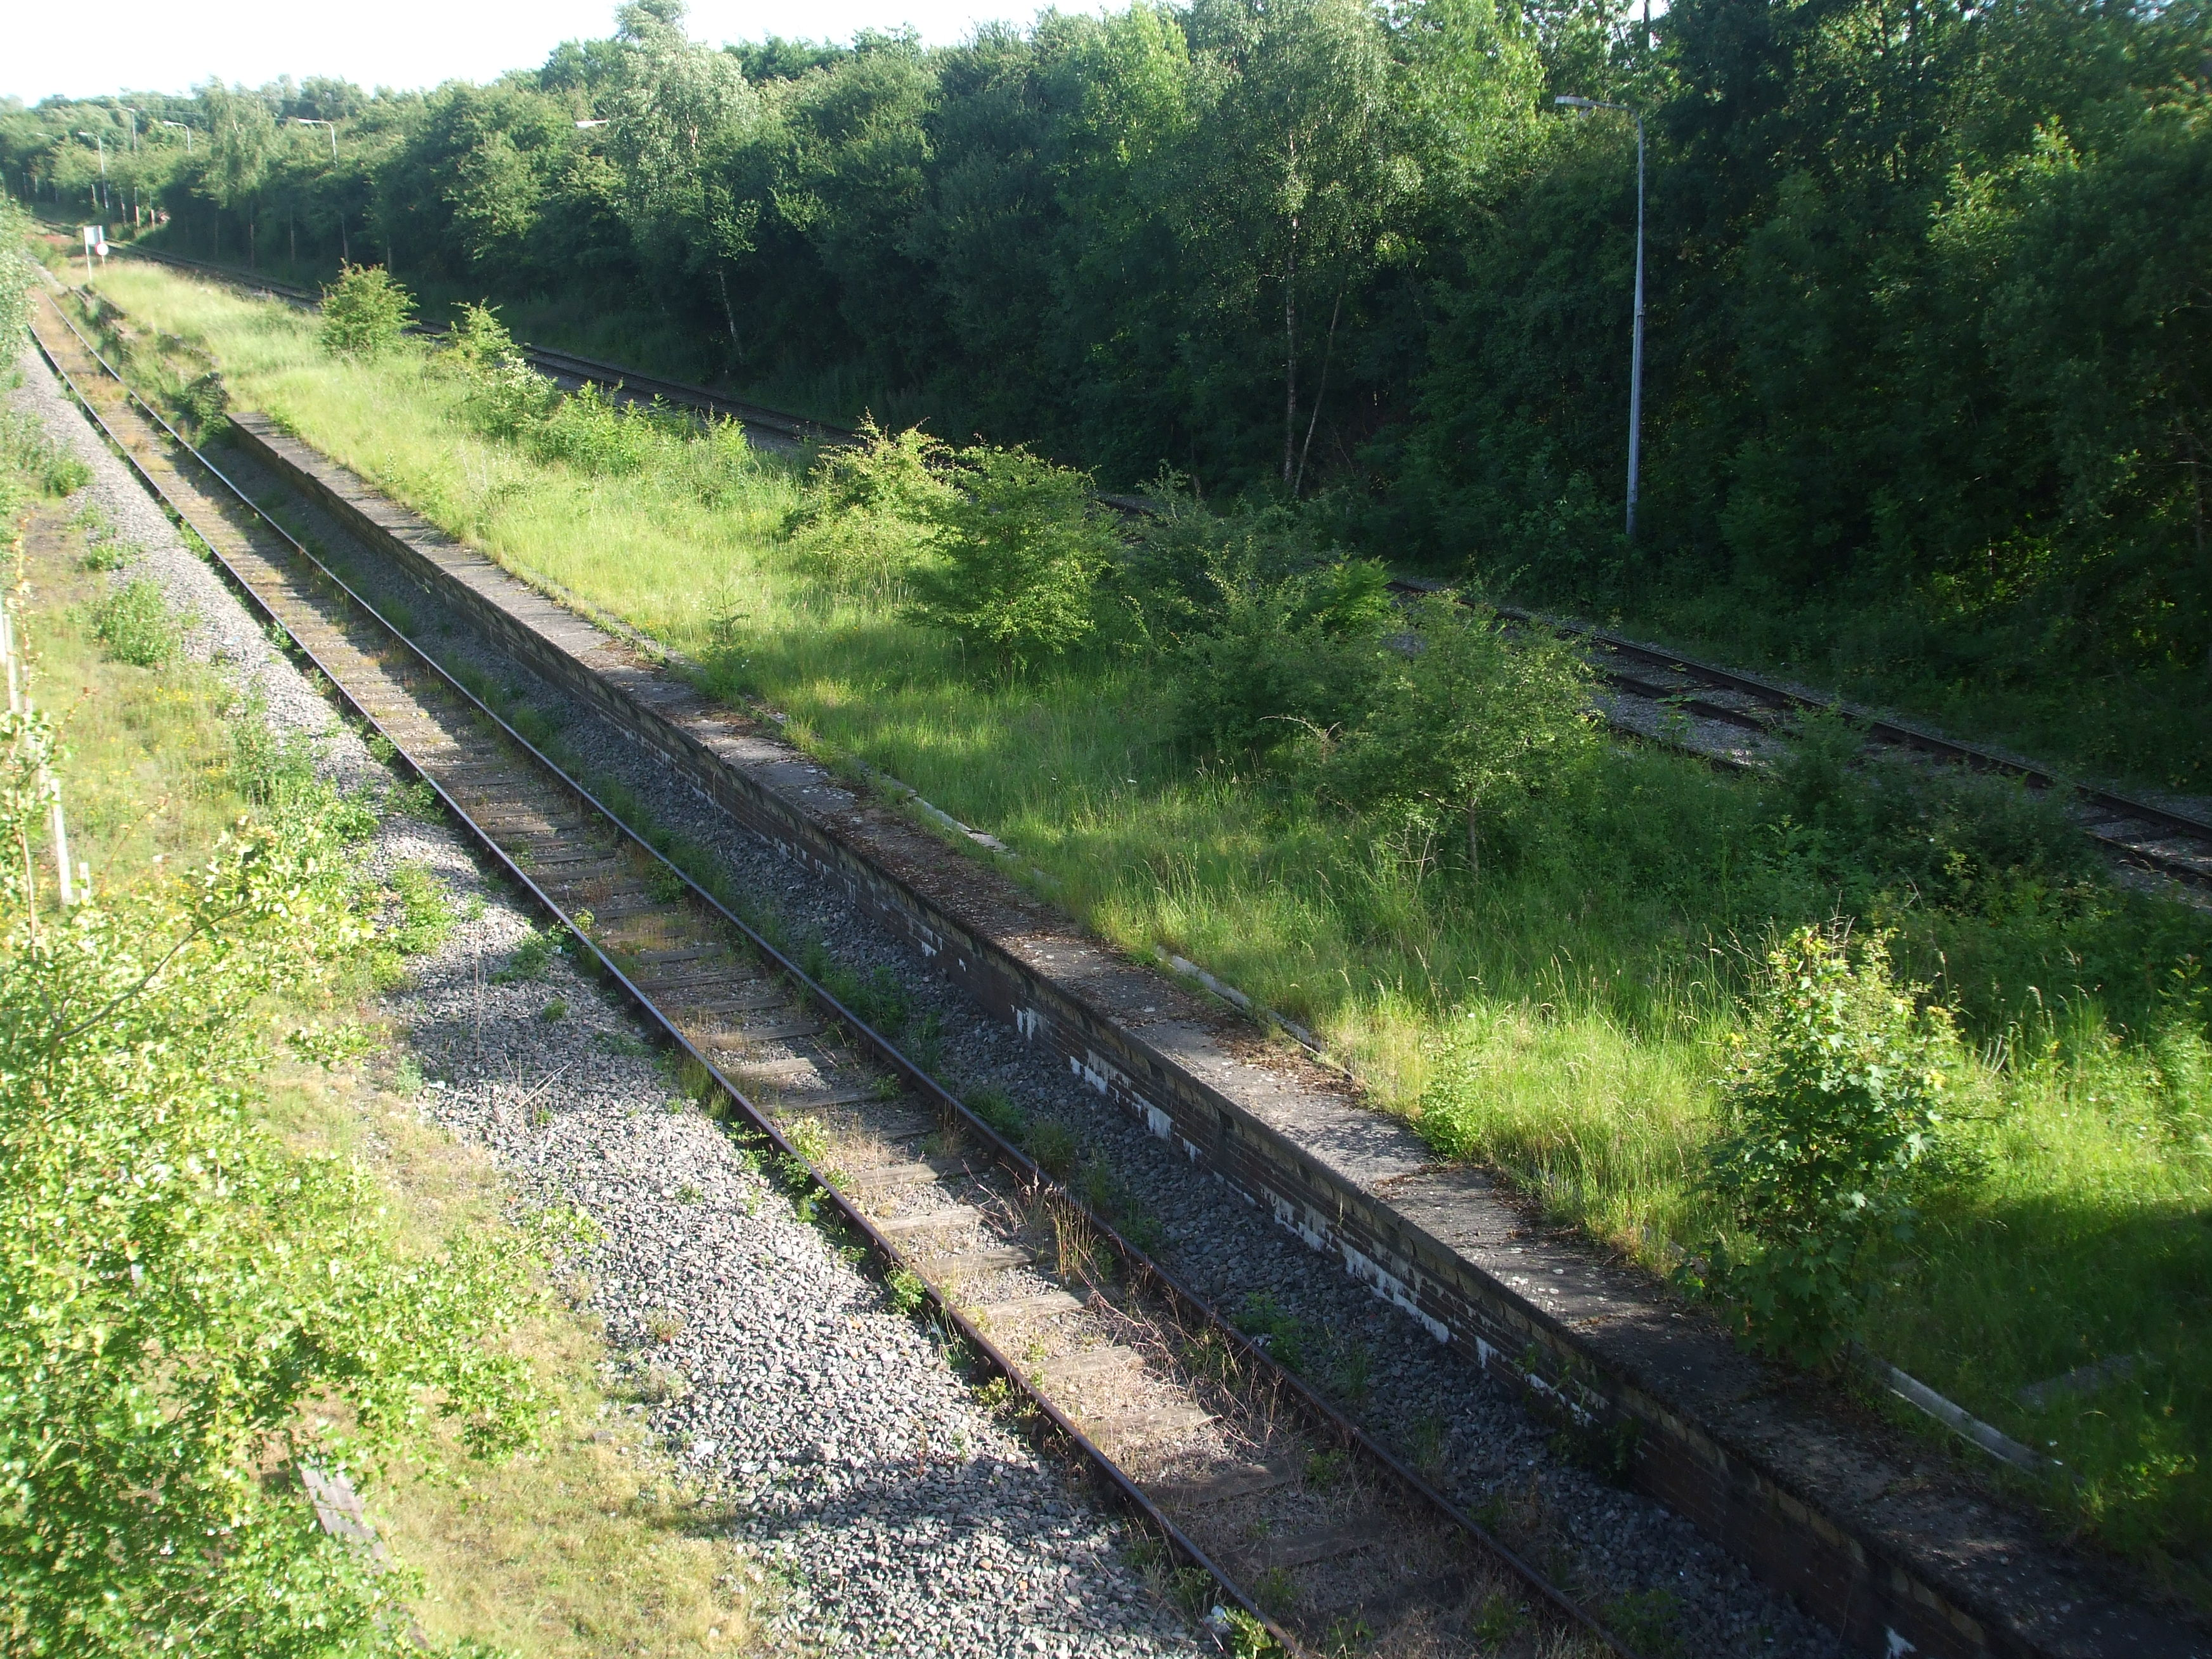 https://upload.wikimedia.org/wikipedia/commons/f/f2/Calvert_Railway_Station.jpg